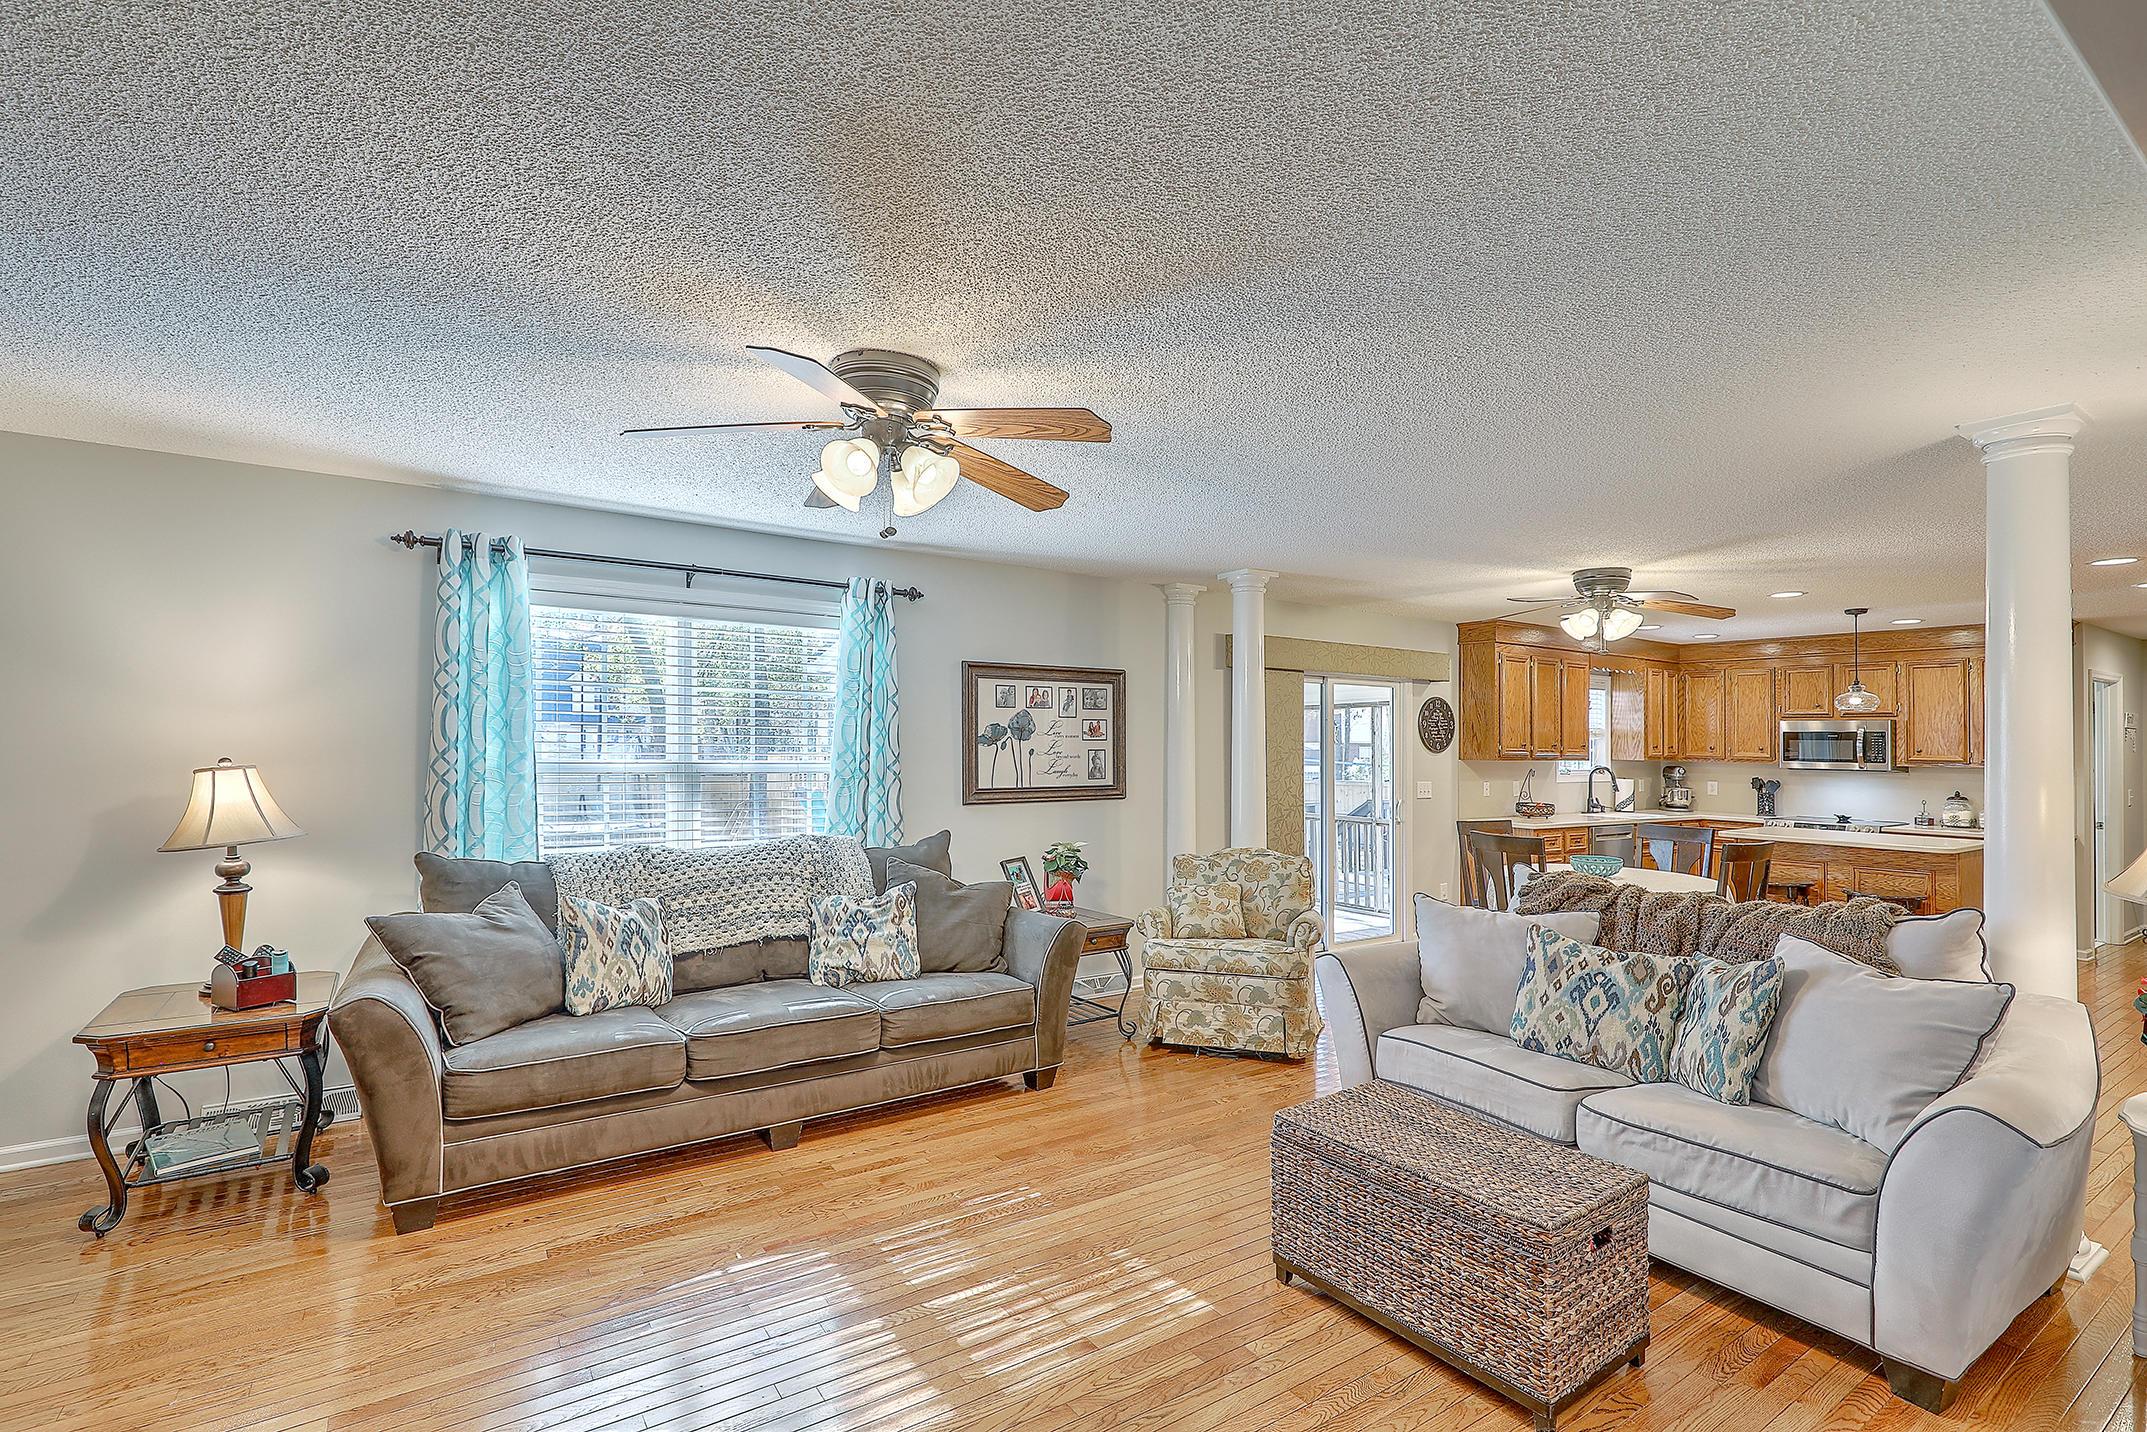 Crowfield Plantation Homes For Sale - 104 Jamesford, Goose Creek, SC - 5